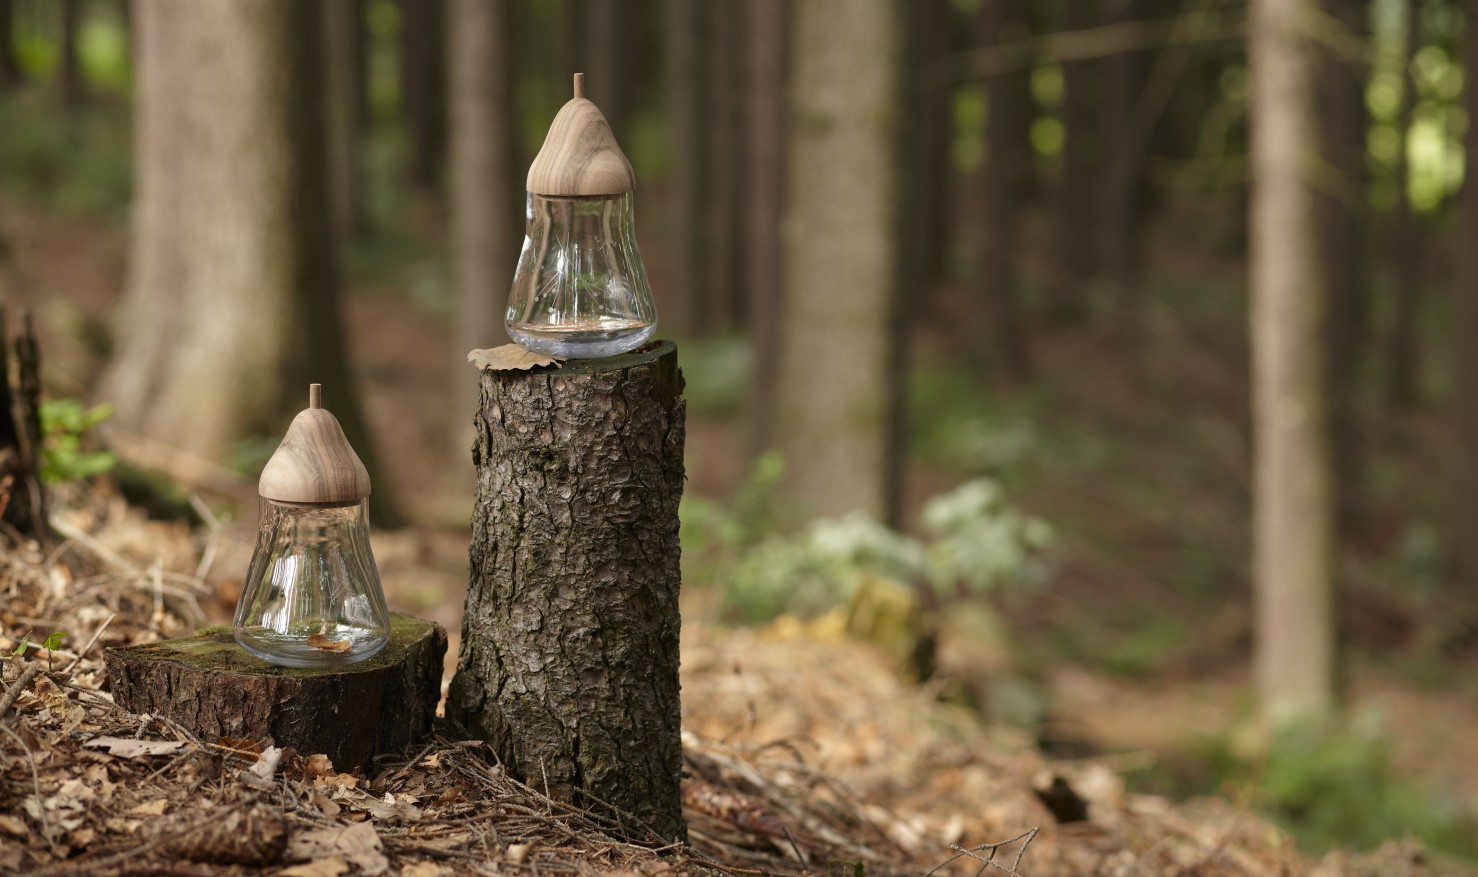 Acorn jar / Among the trees by DECHEM / DECHEM